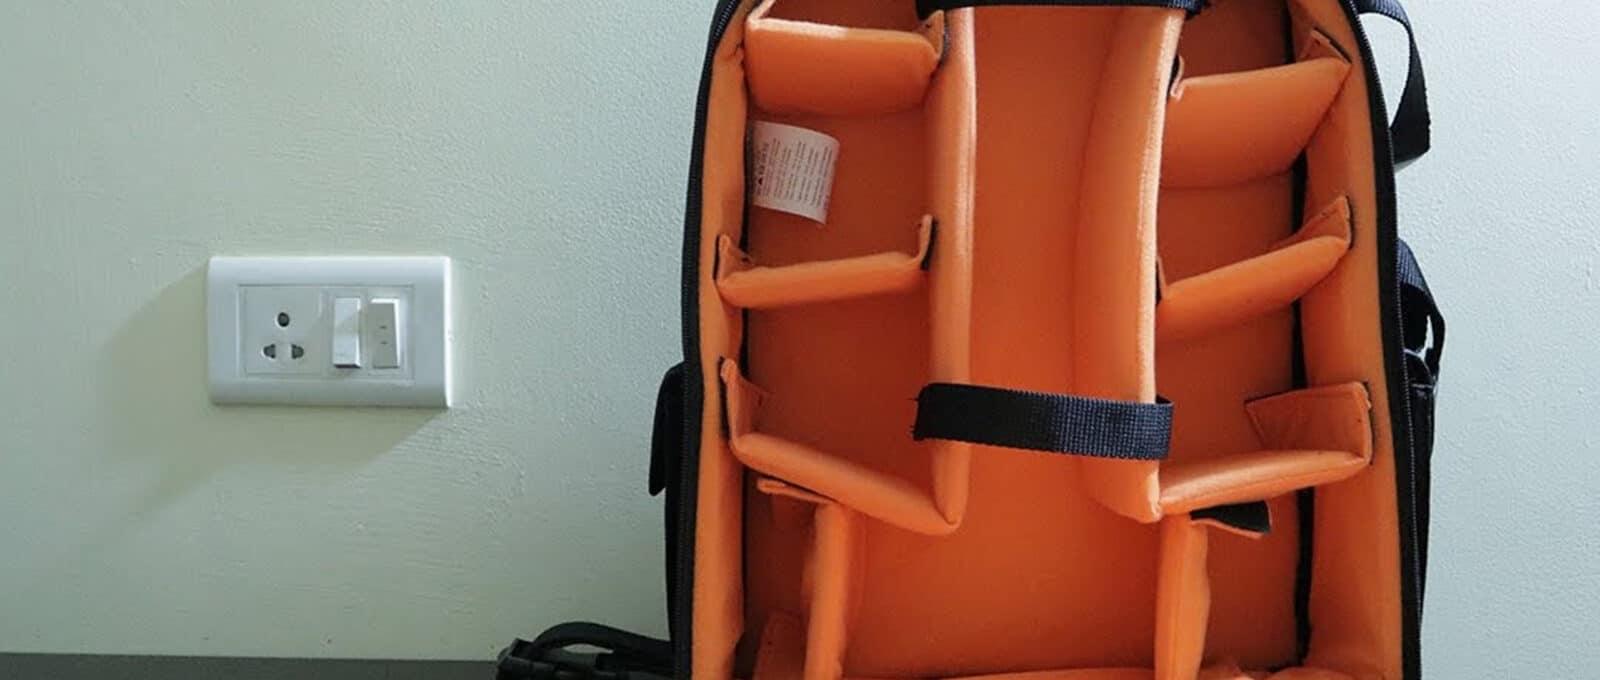 amazonbasic dslr backpack